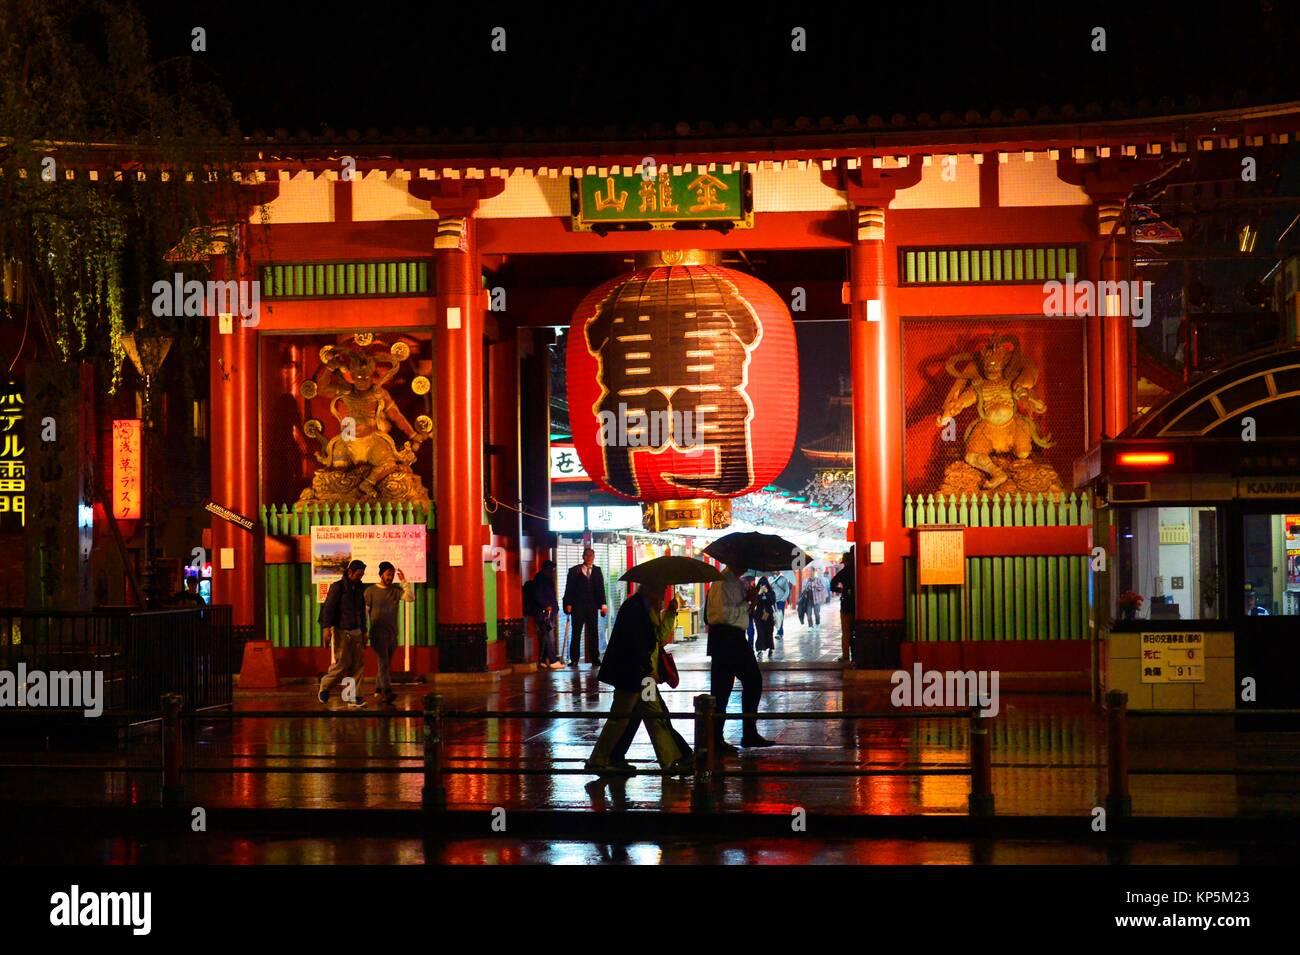 Le temple Senso-ji d'Asakusa de nuit, Tokyo, Japon, Asie. Photo Stock